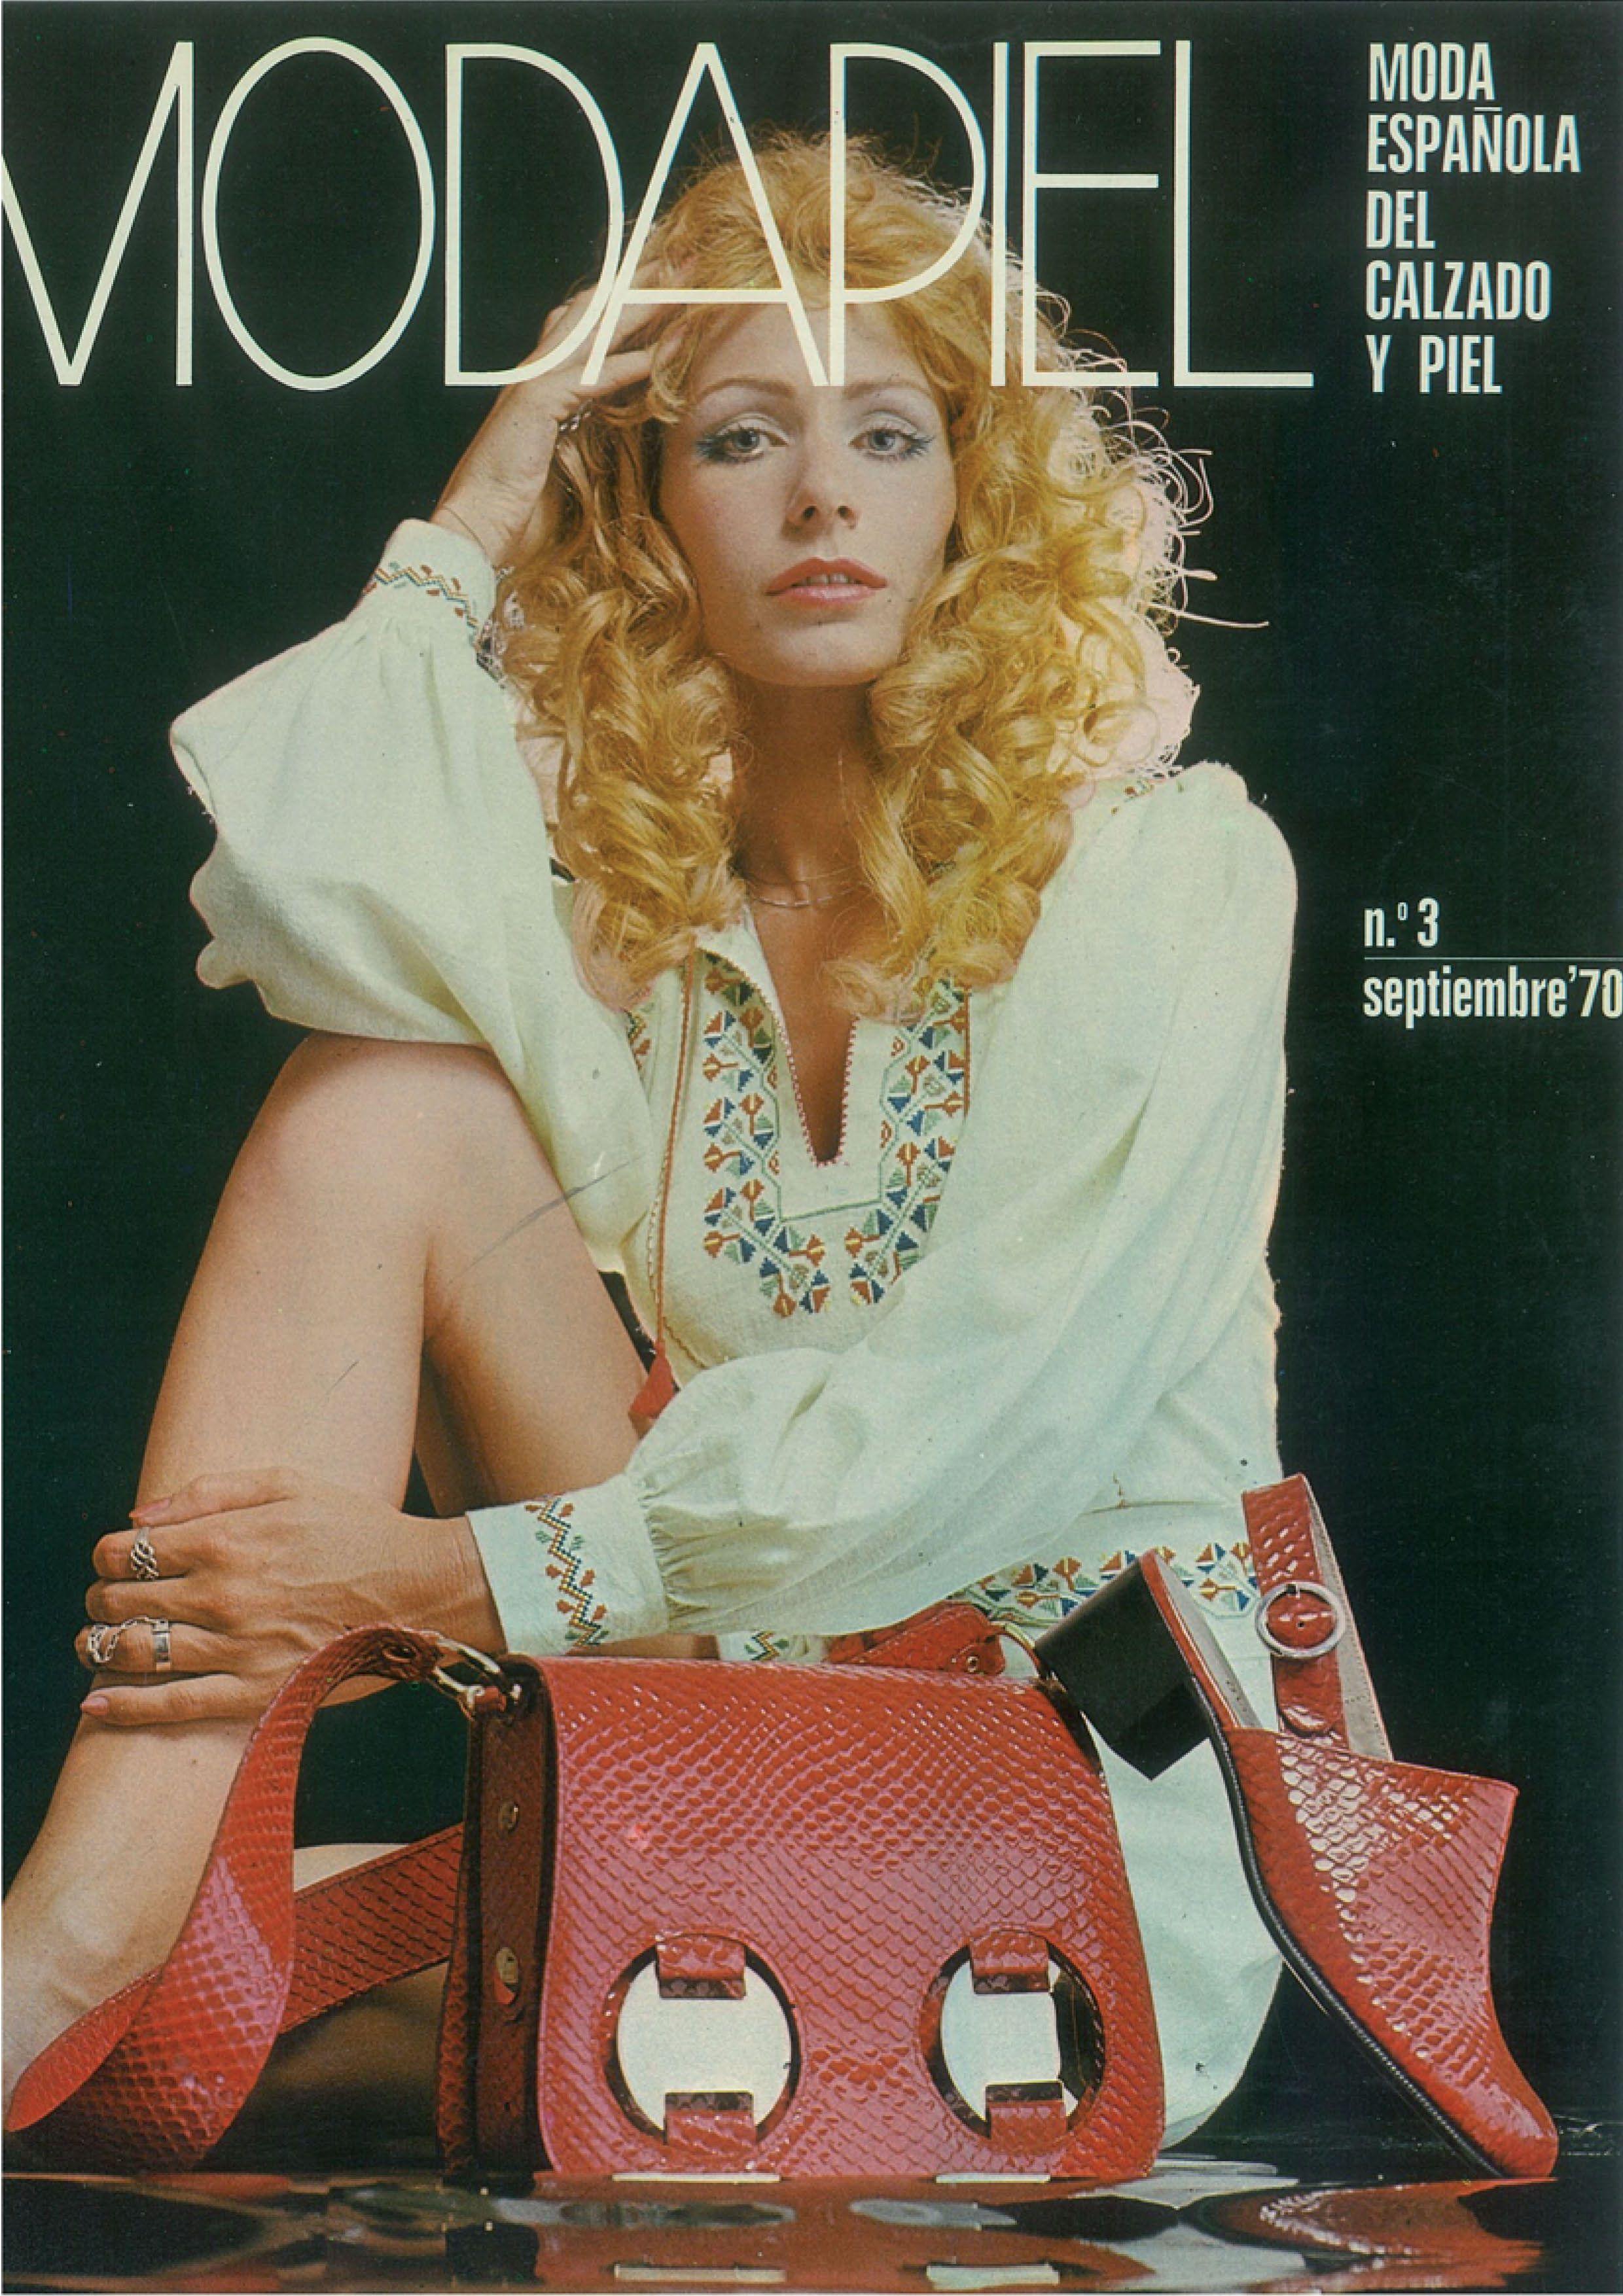 Portada Modapiel #3 1970 www.modapiel.net/ediciones